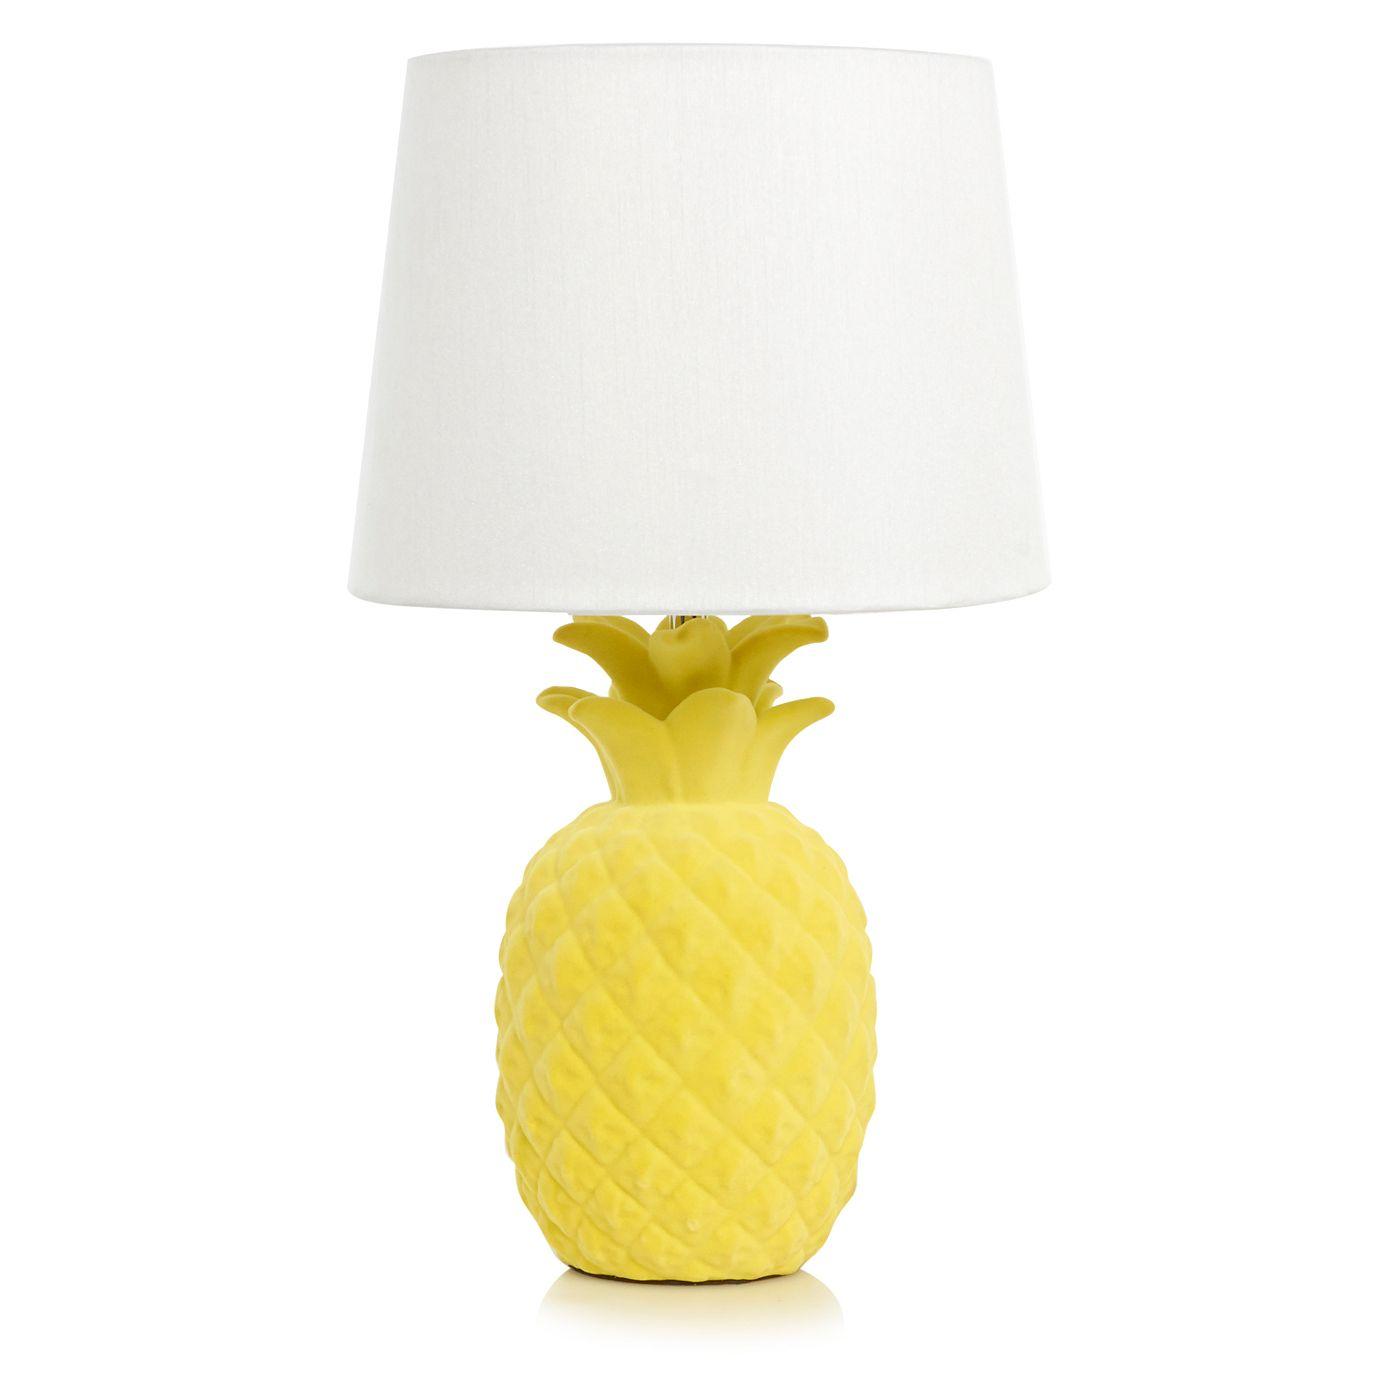 Home Prince's Trust Pineapple Table Lamp Lighting